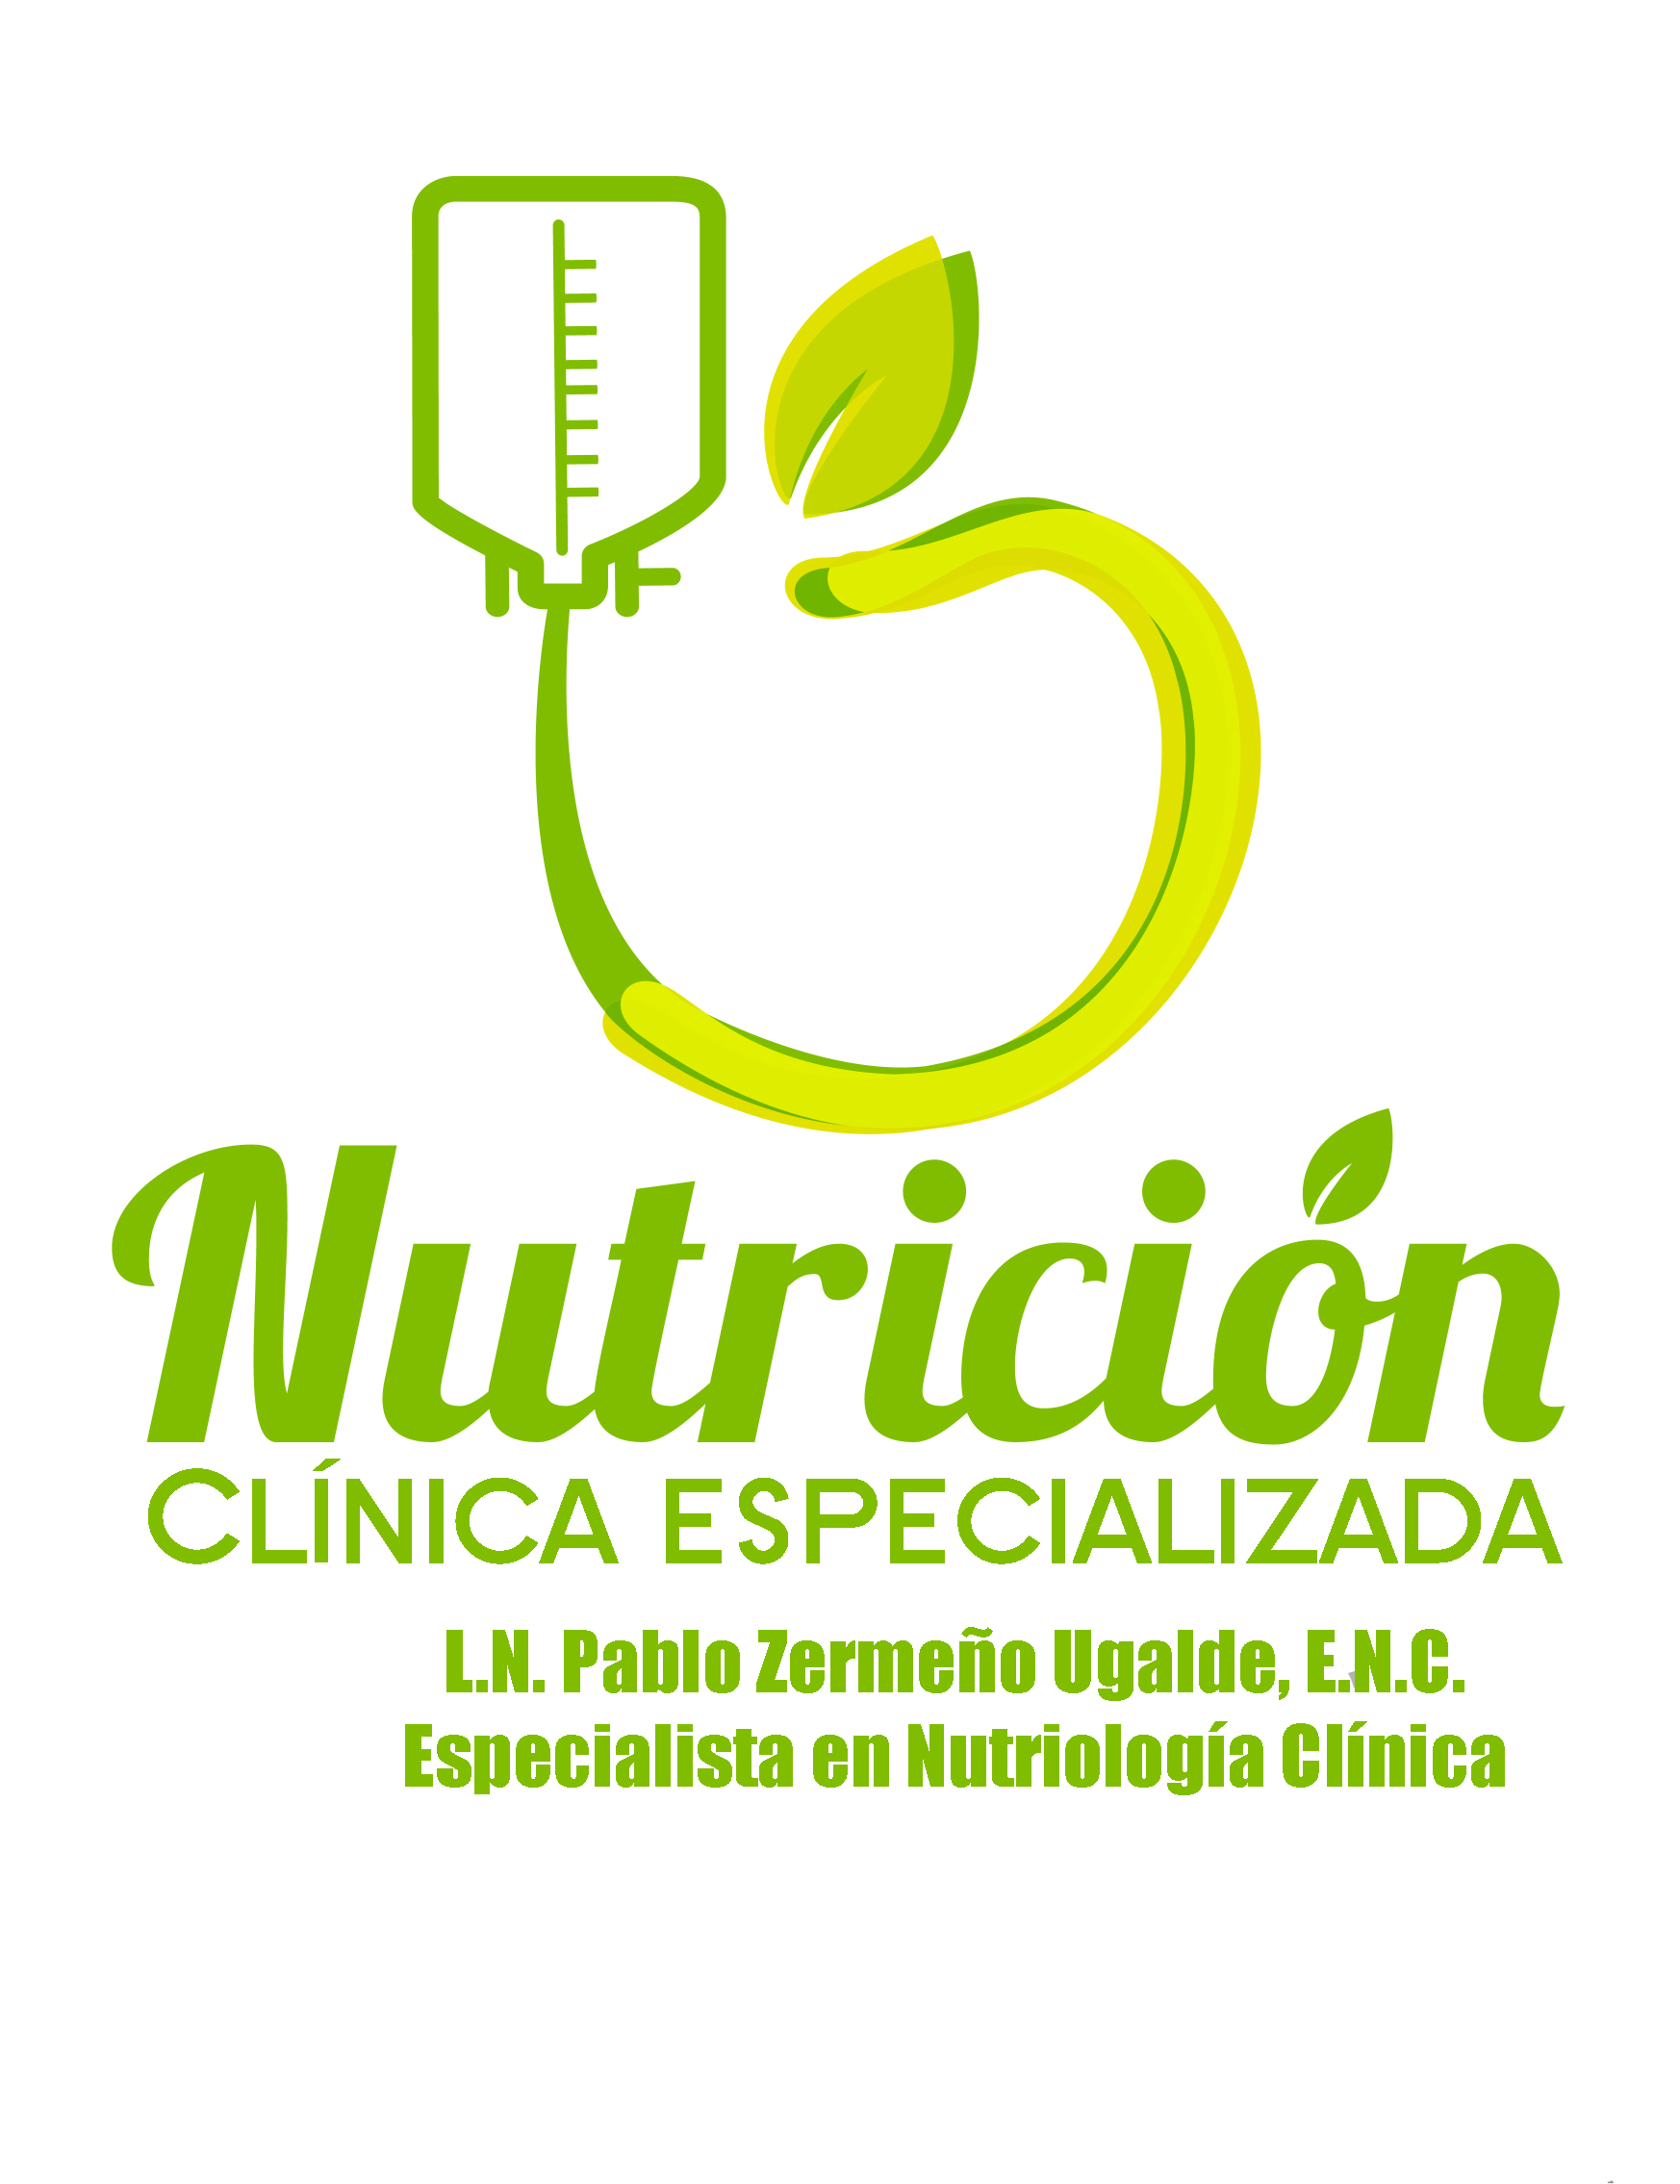 https://0201.nccdn.net/1_2/000/000/106/2fa/logotipo-nutricion-clinica-especializada-verde-2020.jpg